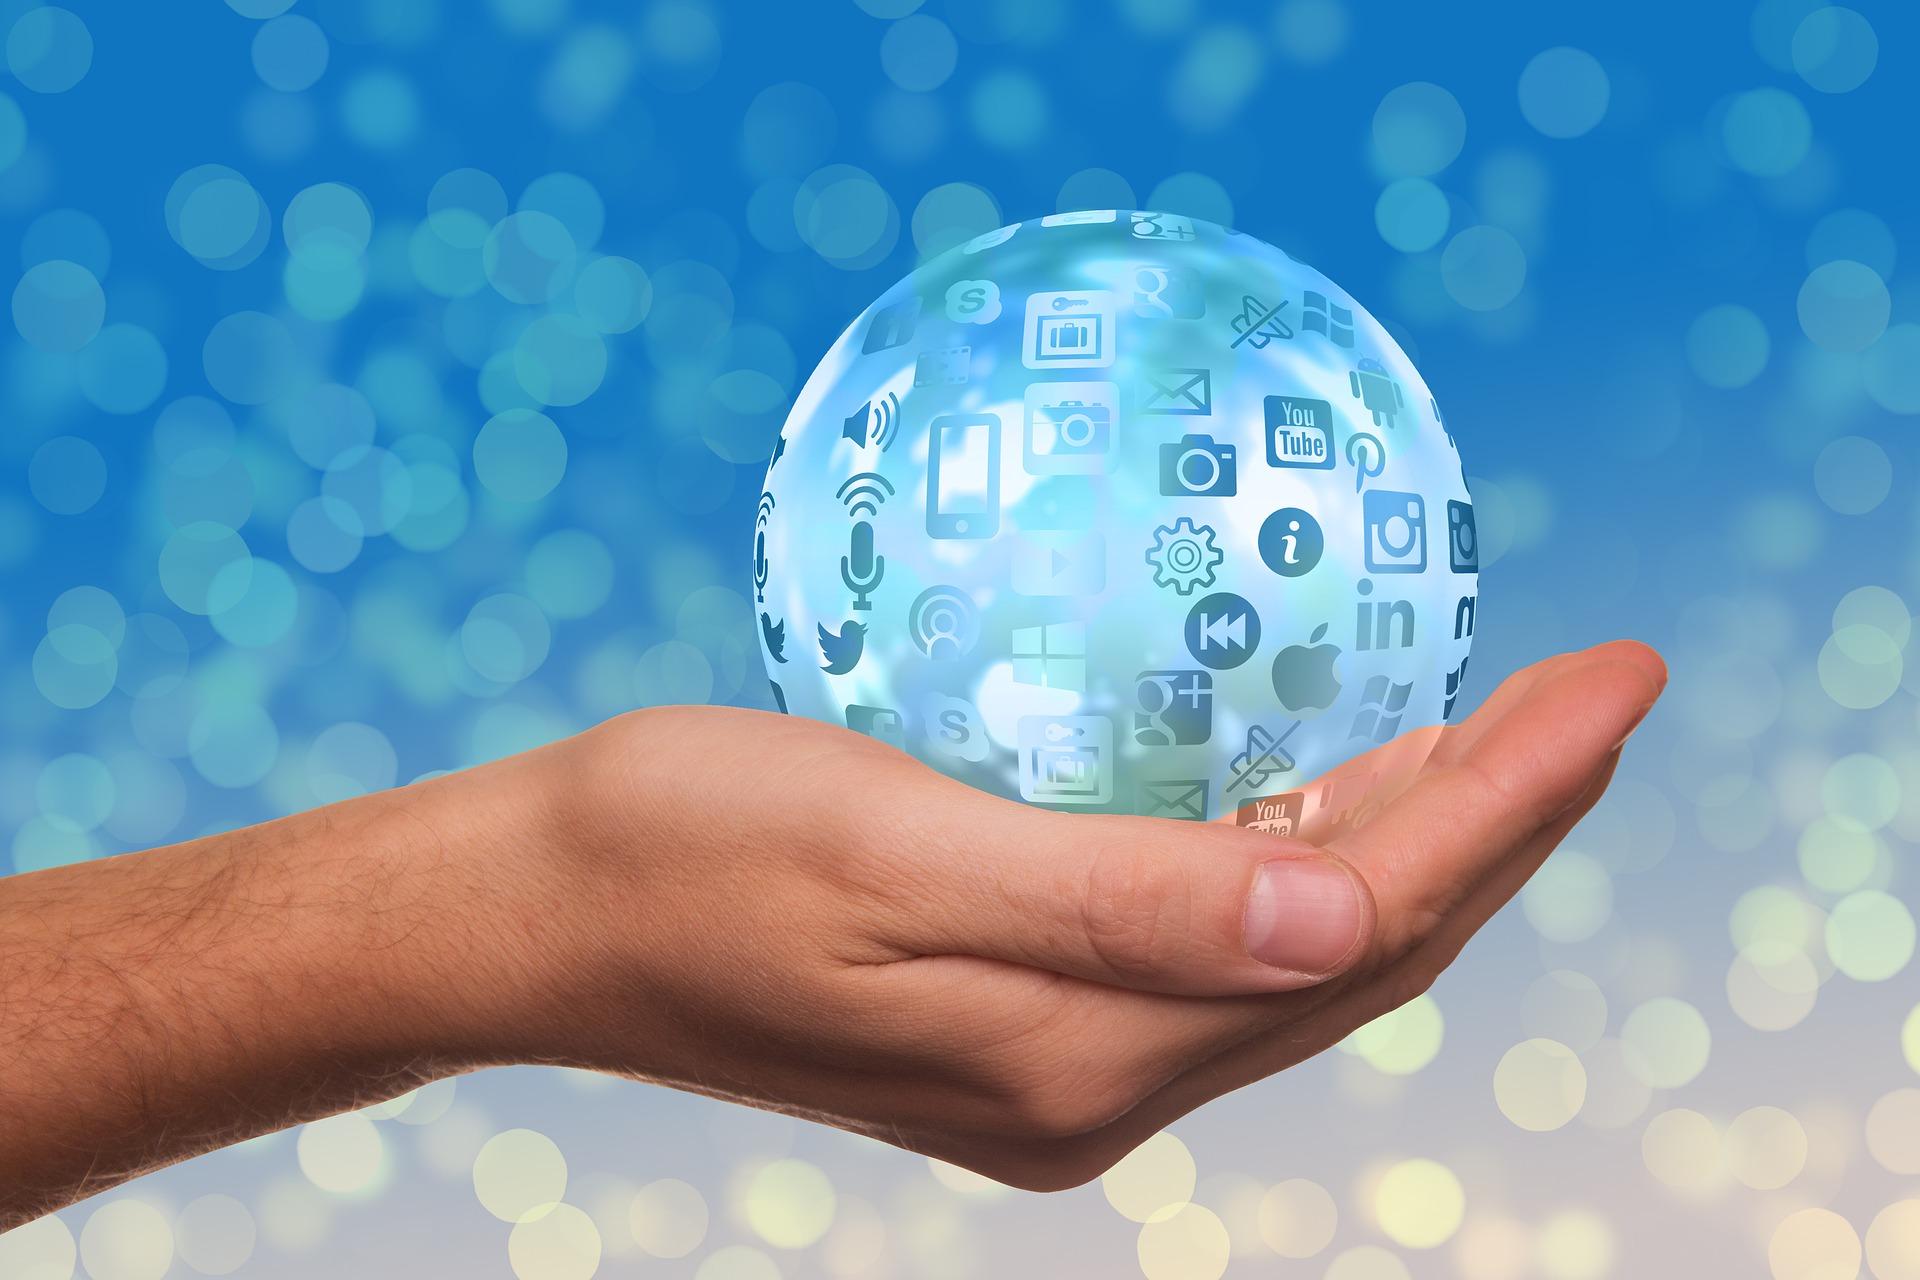 virtual services get creative - SparkBoutik